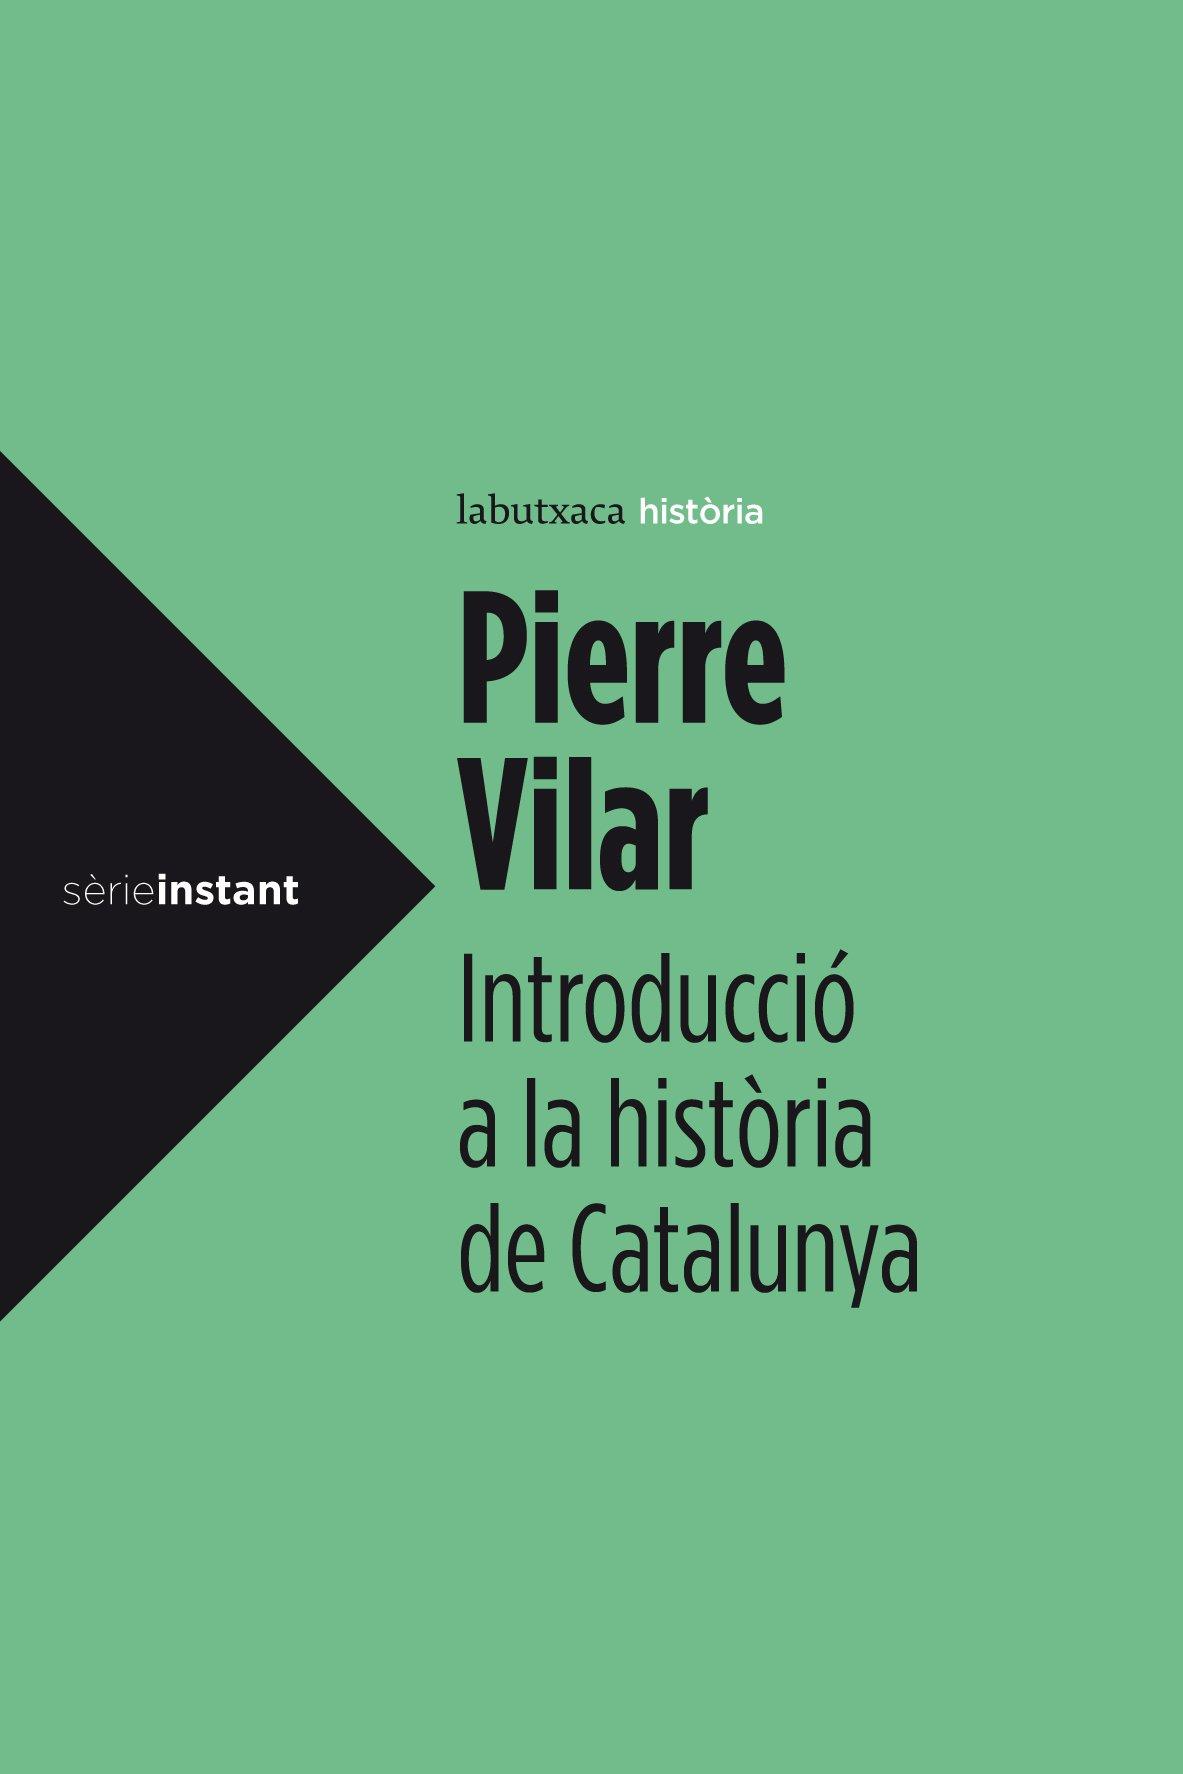 Introducció A La Història De Catalunya (LB): Amazon.es: Vilar, Pierre: Libros